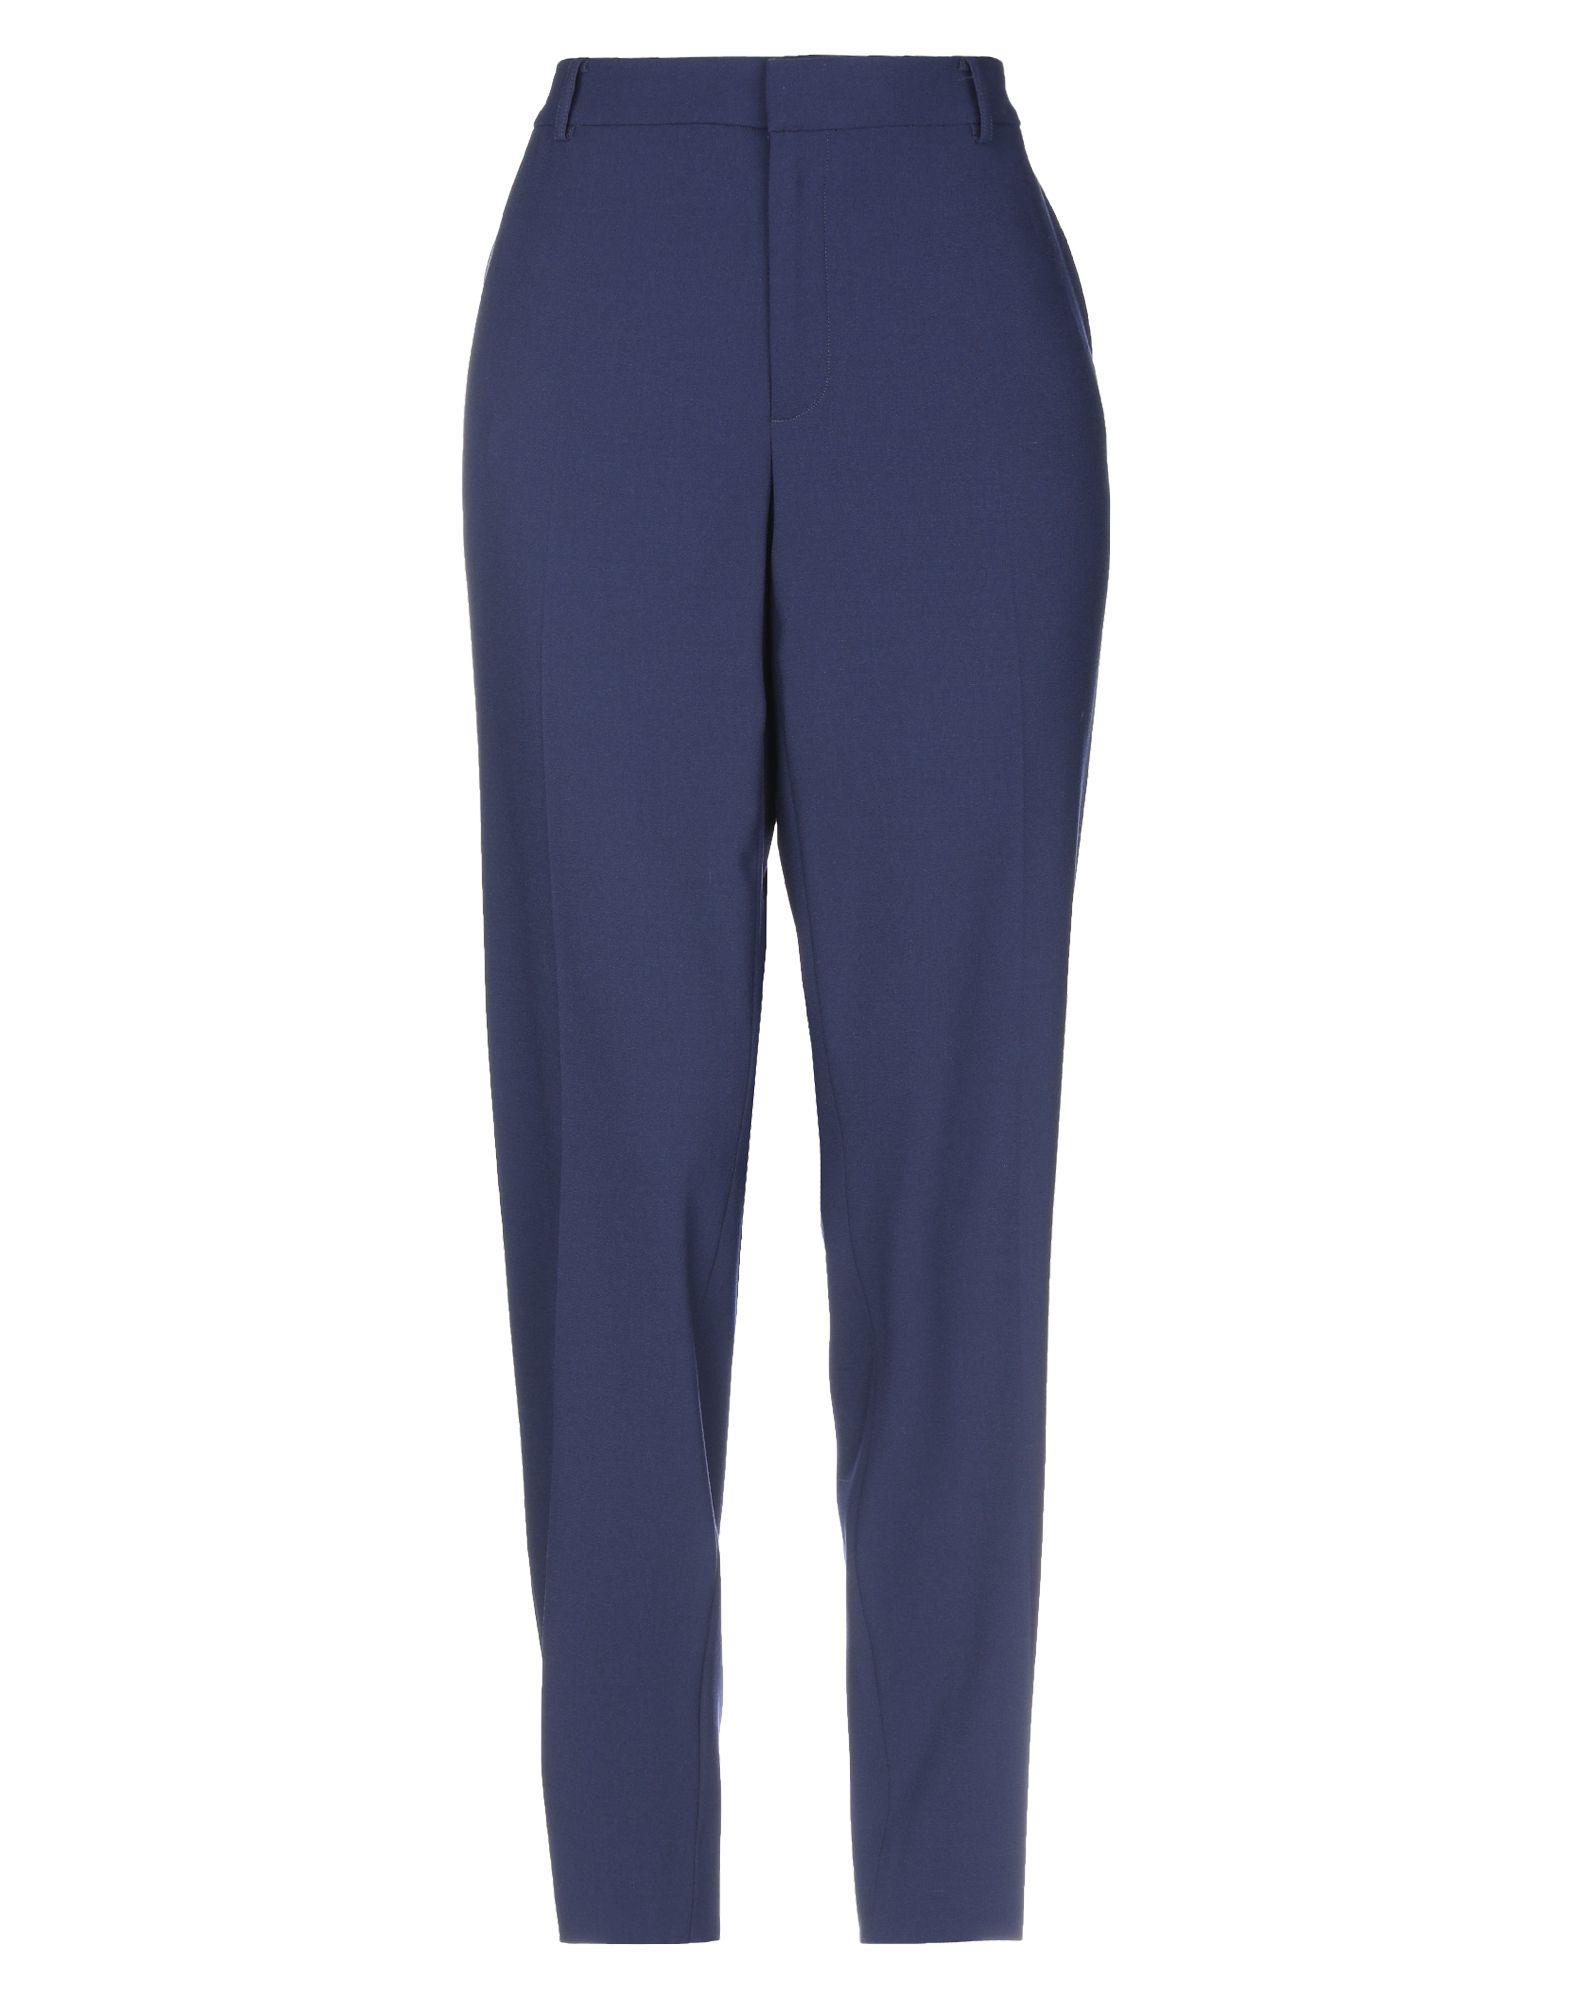 RALPH LAUREN COLLECTION Повседневные брюки ralph lauren collection повседневные брюки